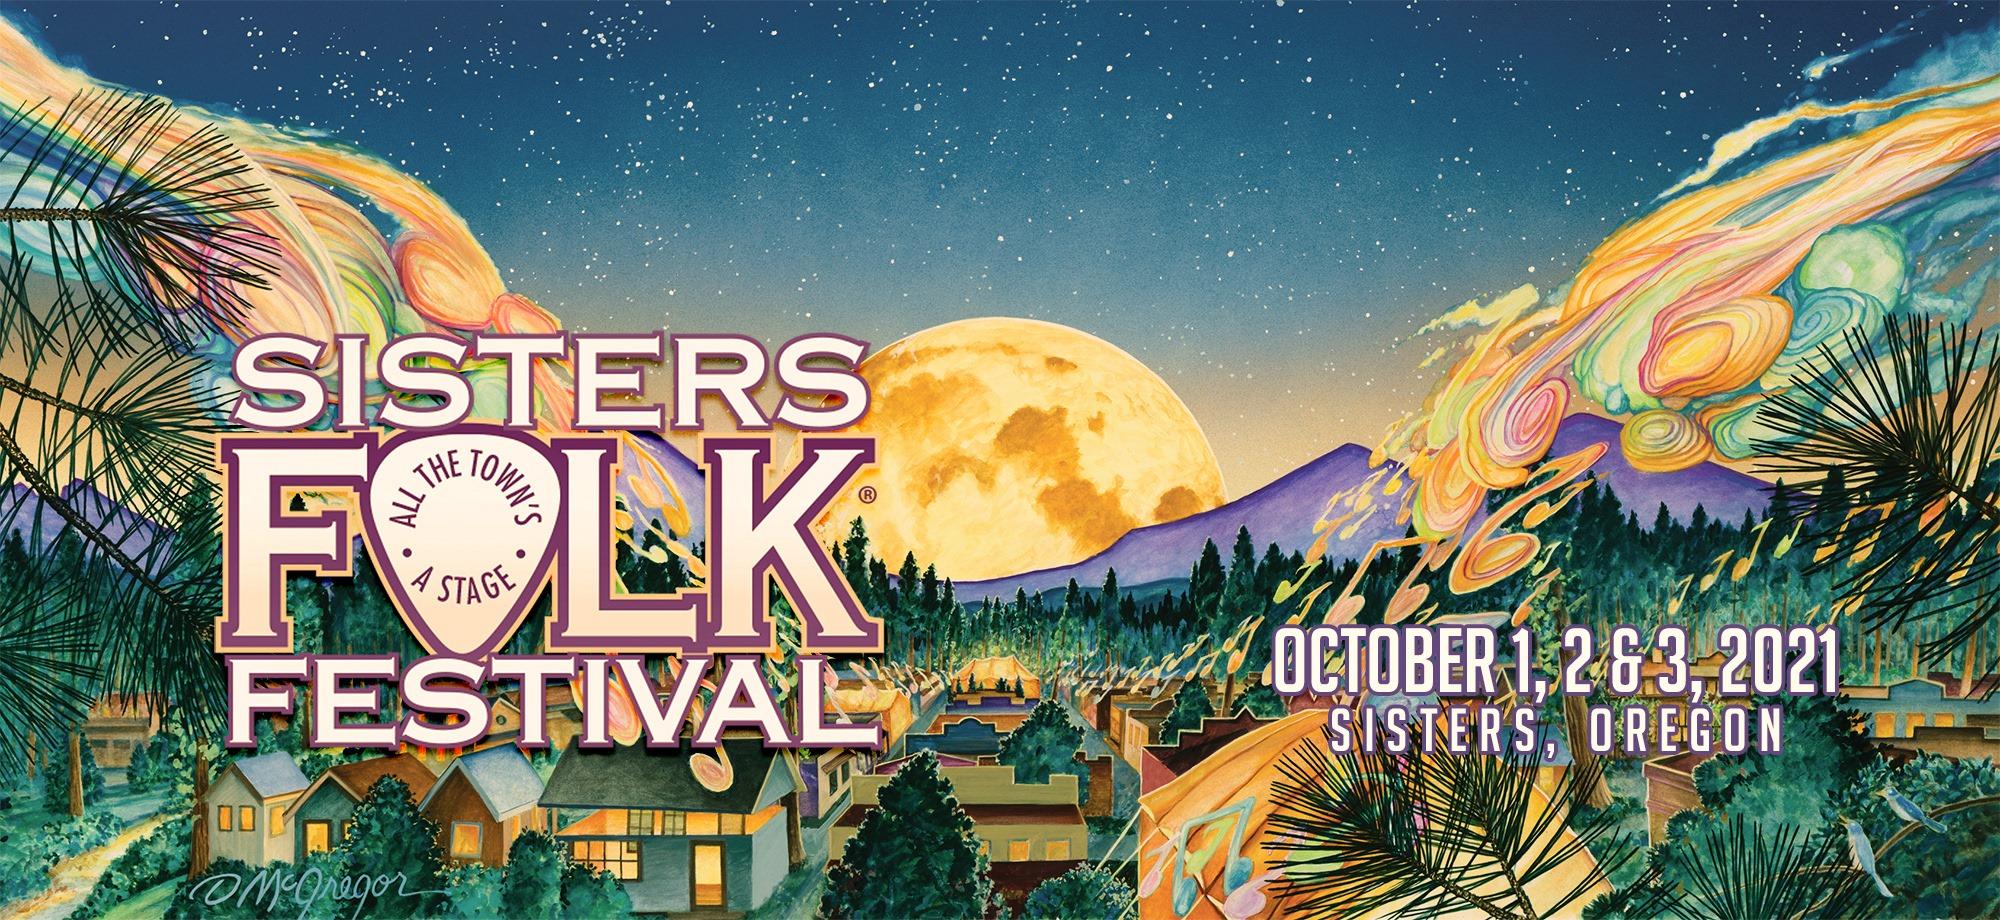 Sisters Folk Festival Oregon 2021